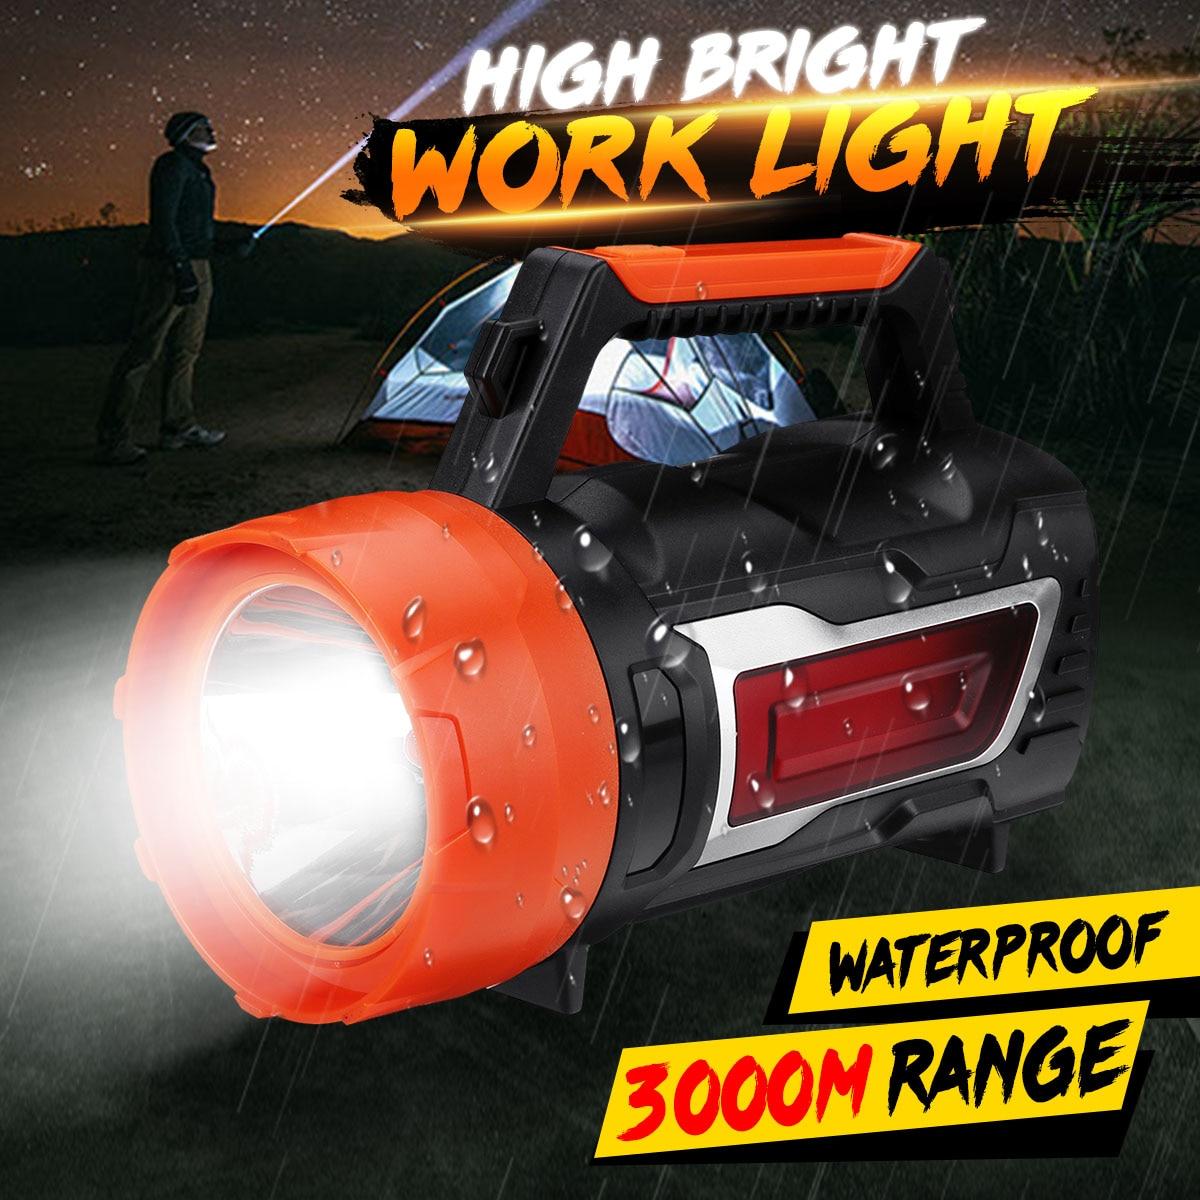 Super Bright Spotlight Portable Fishing Lamp 500W LED Searchlight Hunting Tool